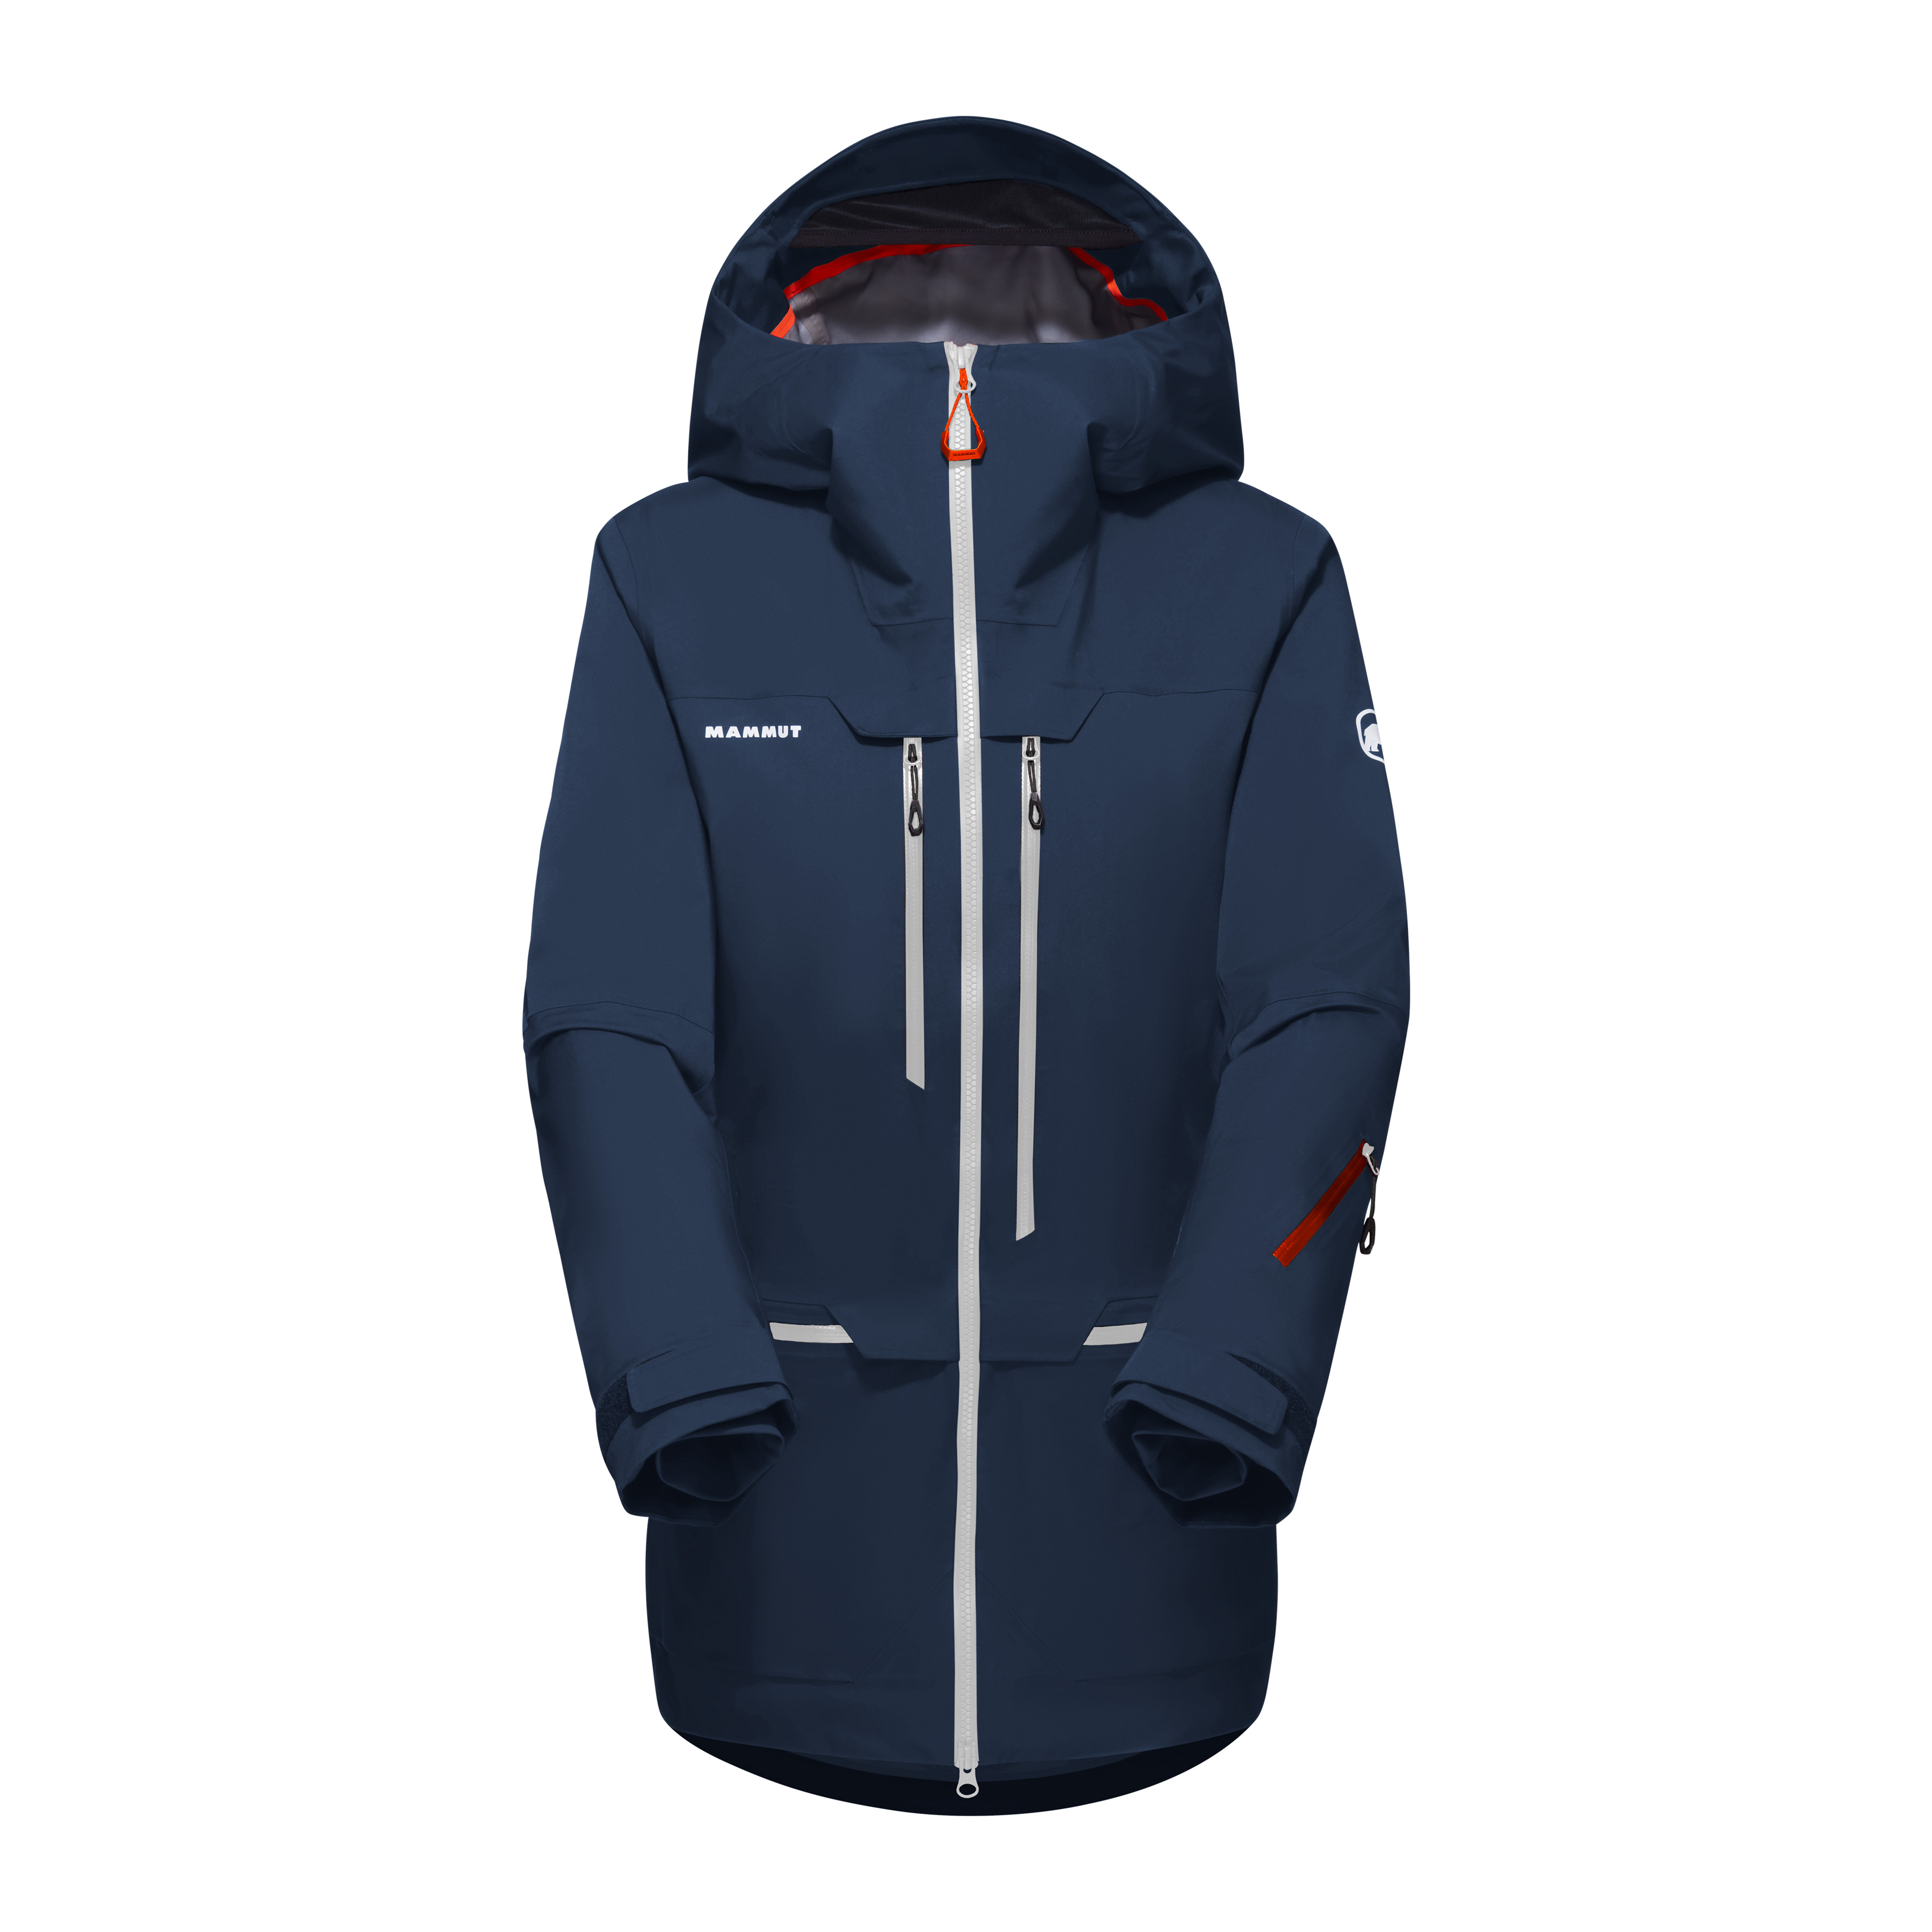 Haldigrat HS Hooded Jacket Women - marine-white, XS thumbnail